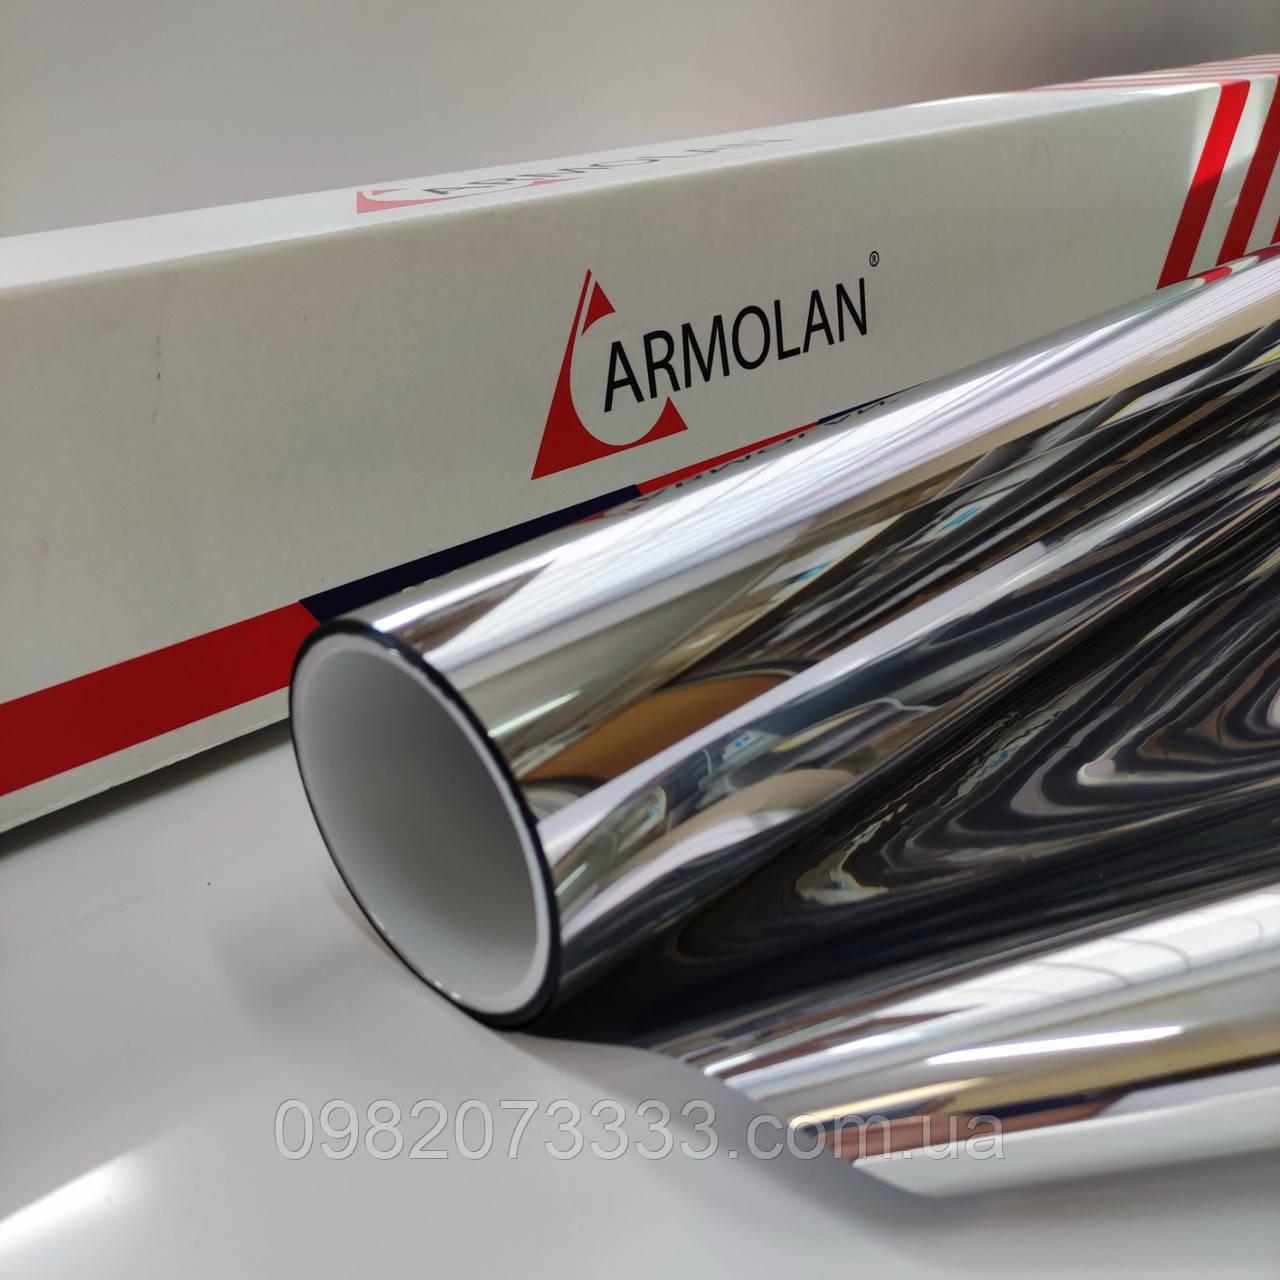 Солнцезащитная плёнка Armolan Silver 35% USA зеркальная для тонировки окон. Цена за размер 150х100см.